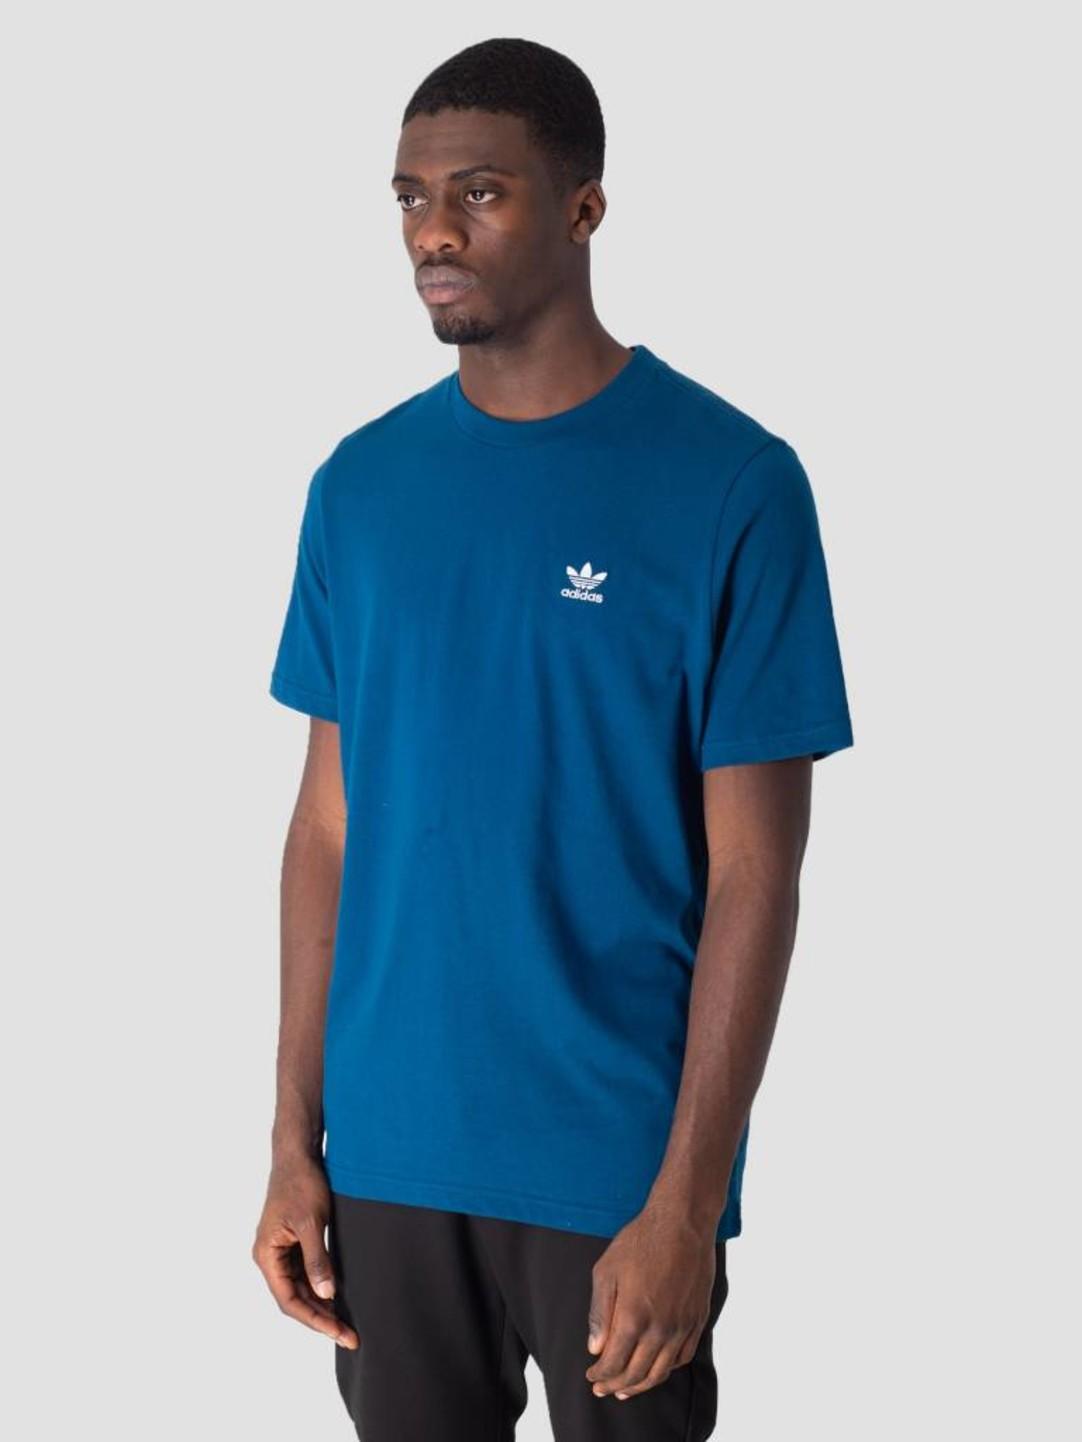 7f3231fb6 adidas Monogram T-Shirt Legmar DV2025 | FRESHCOTTON